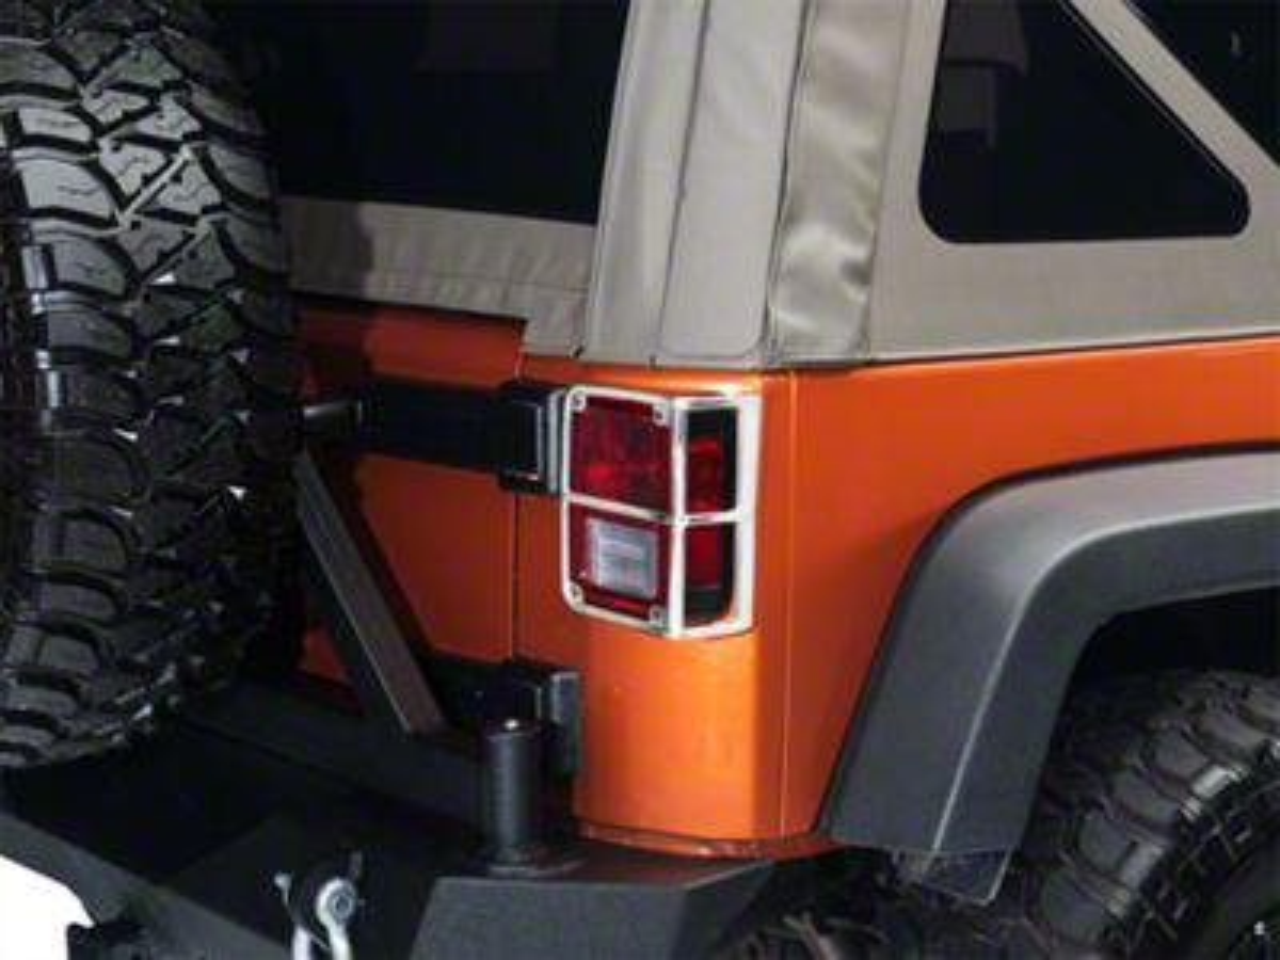 Smittybilt Euro Tail Light Guards - Stainless Steel (07-18 Jeep Wrangler JK)